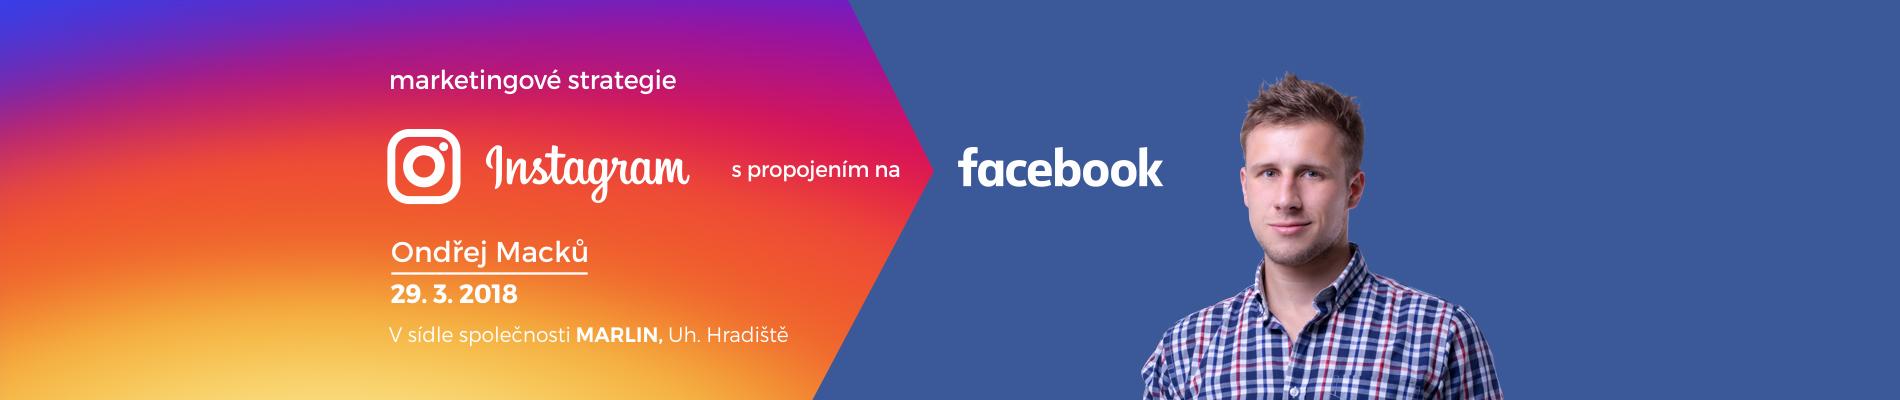 Instagram s propojením na Facebook – marketingové strategie